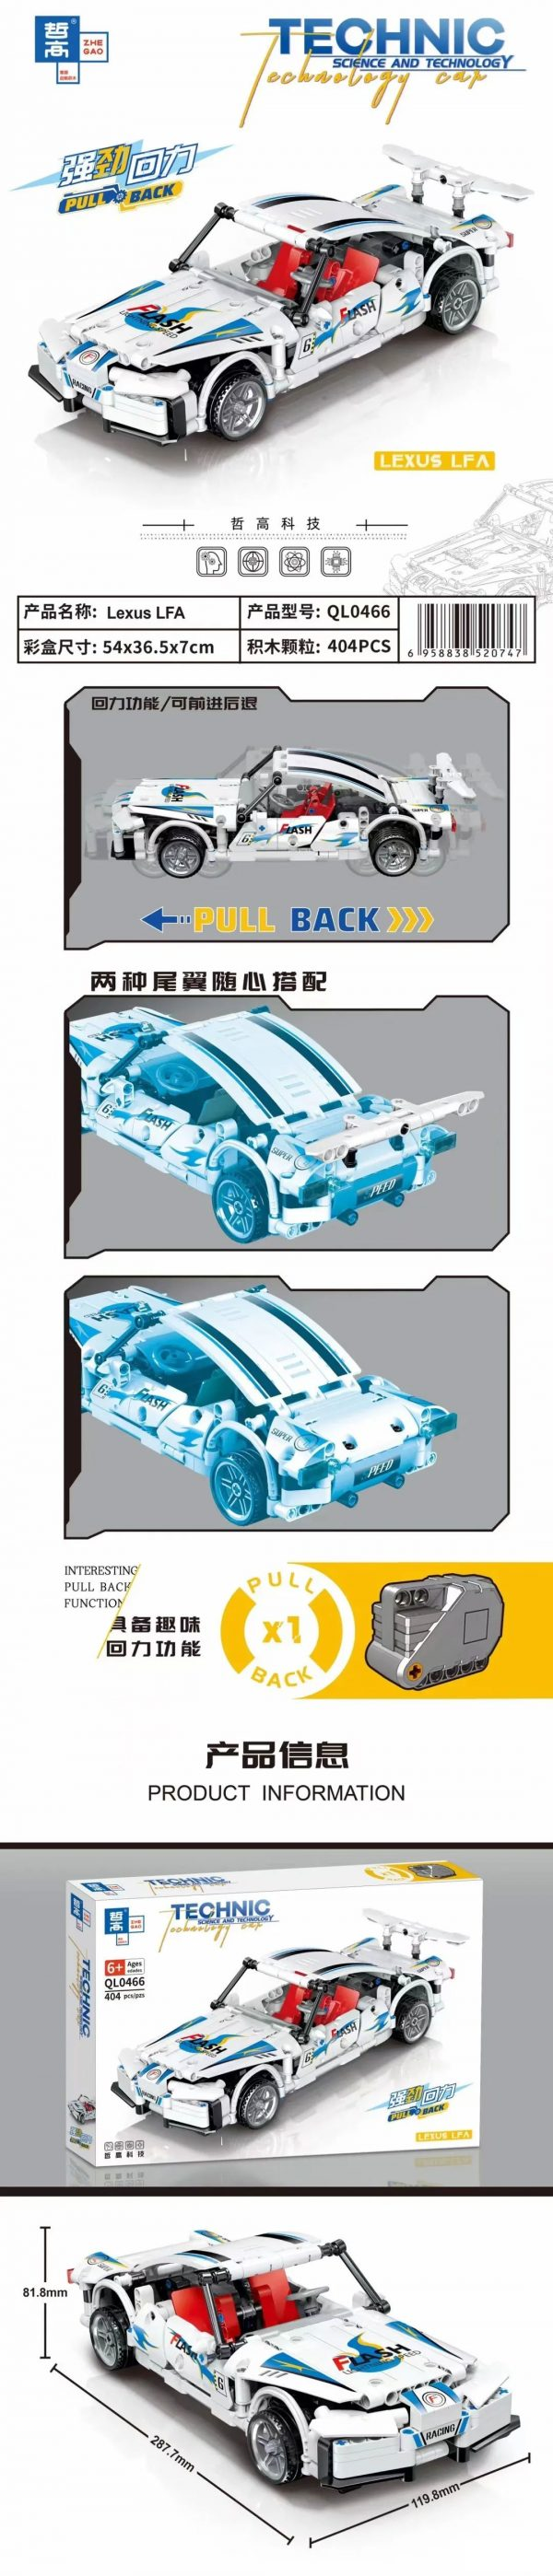 ZHEGAO QL0466 Texas LFA Pull Back Car 0